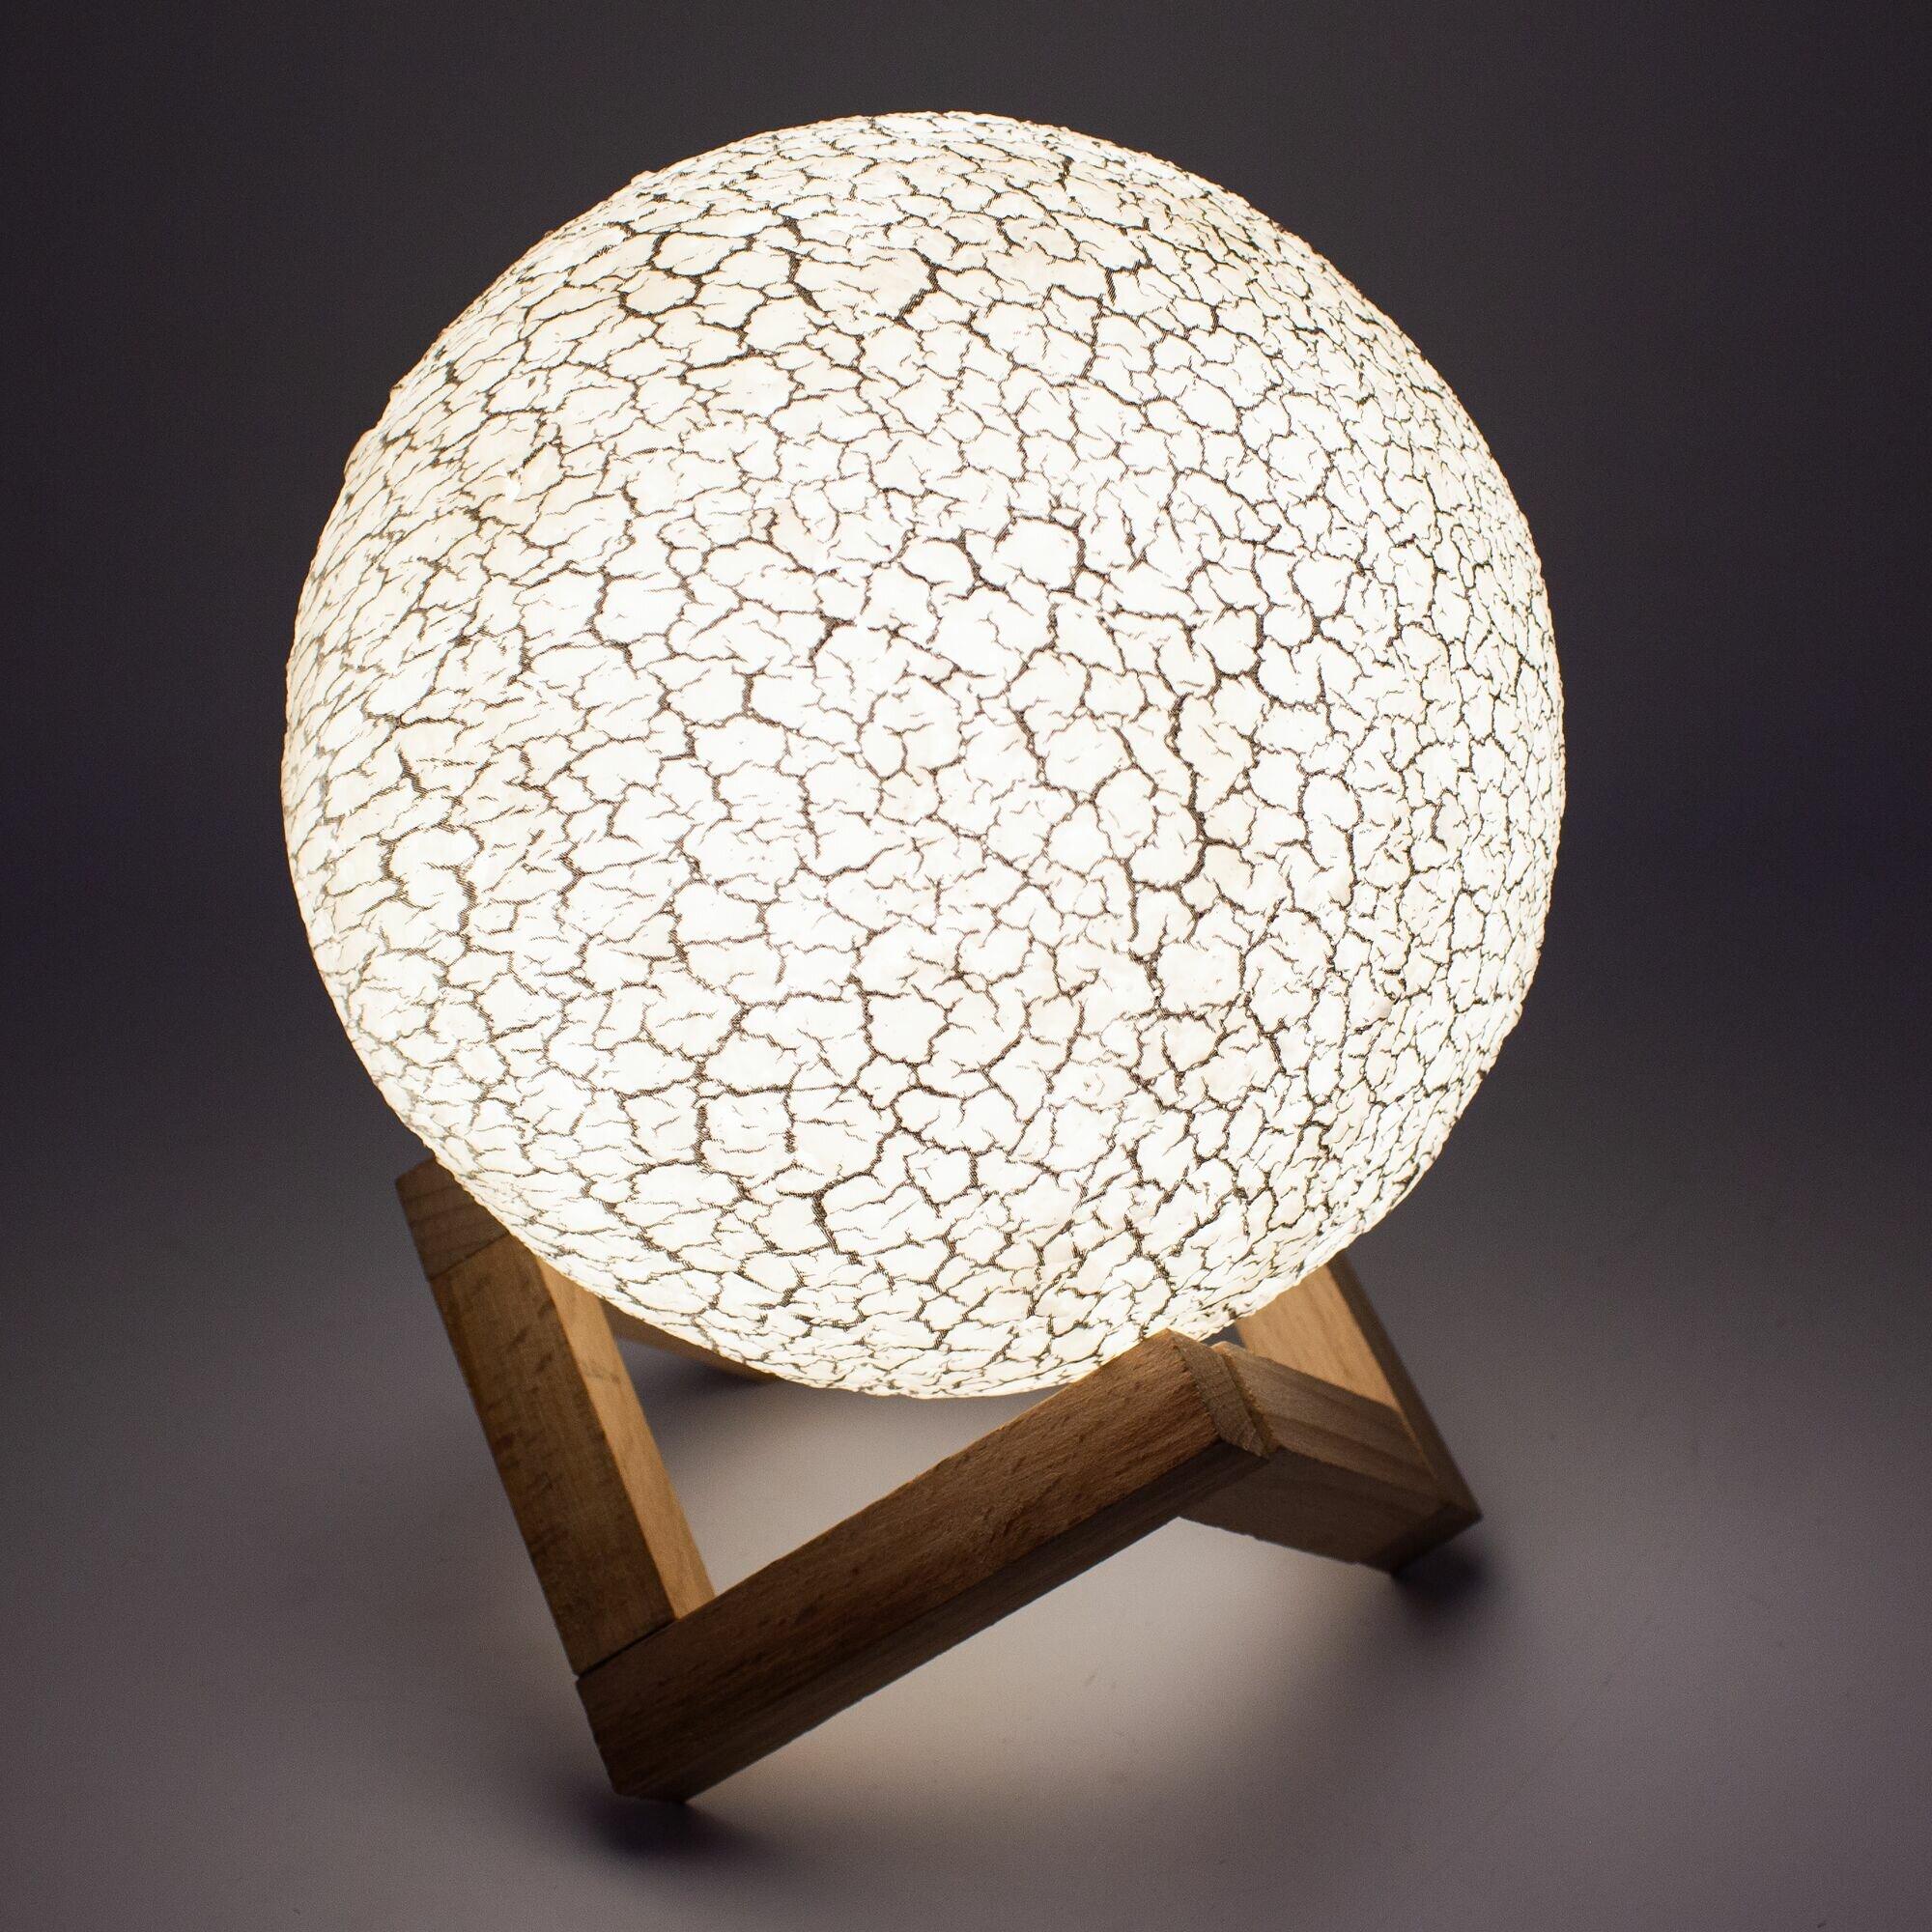 Лампа-ночник Sfero SF109 Астероид 3 цвета Сенсорная d15 см.